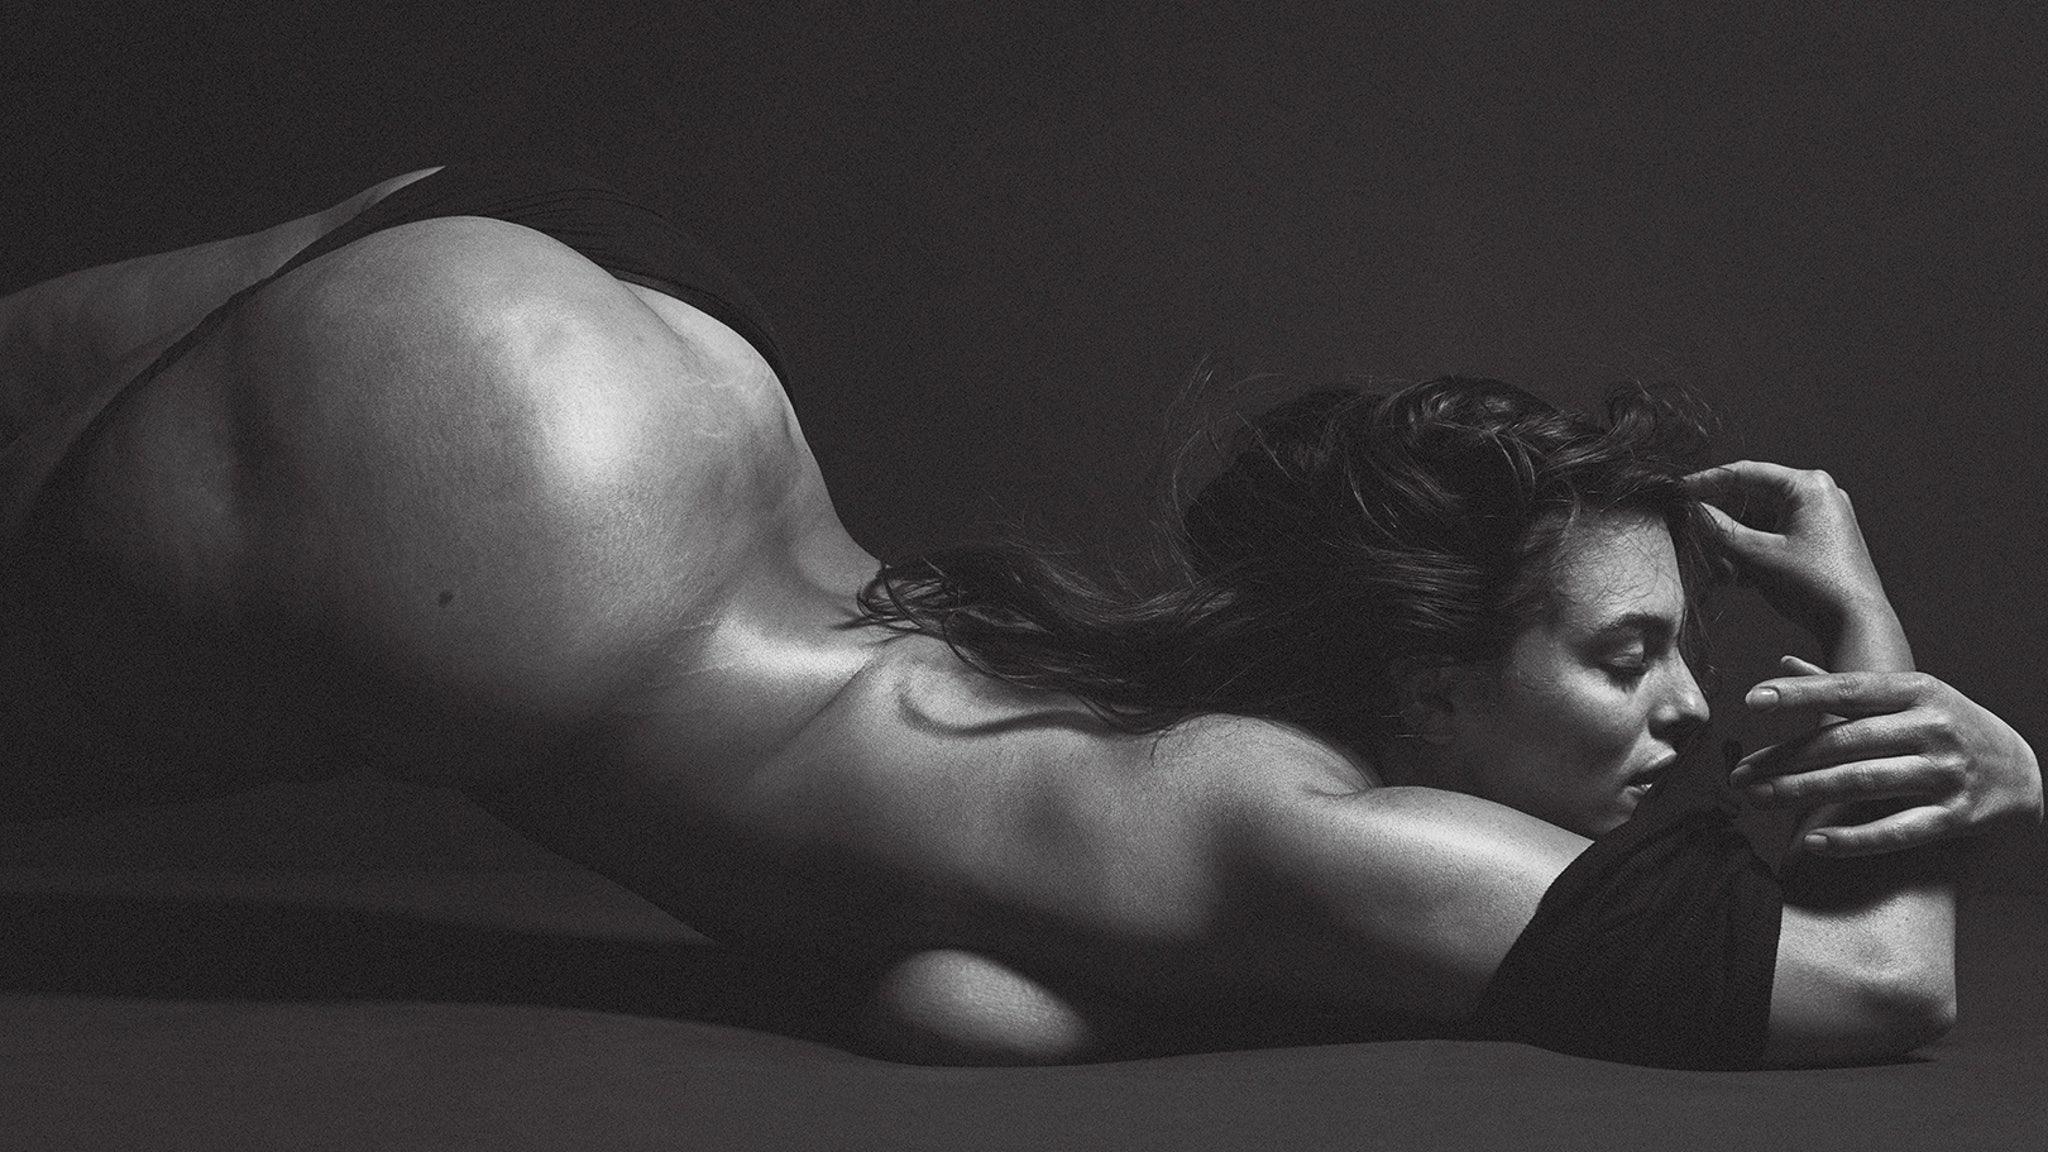 Ashley graham nude photo the nip slip